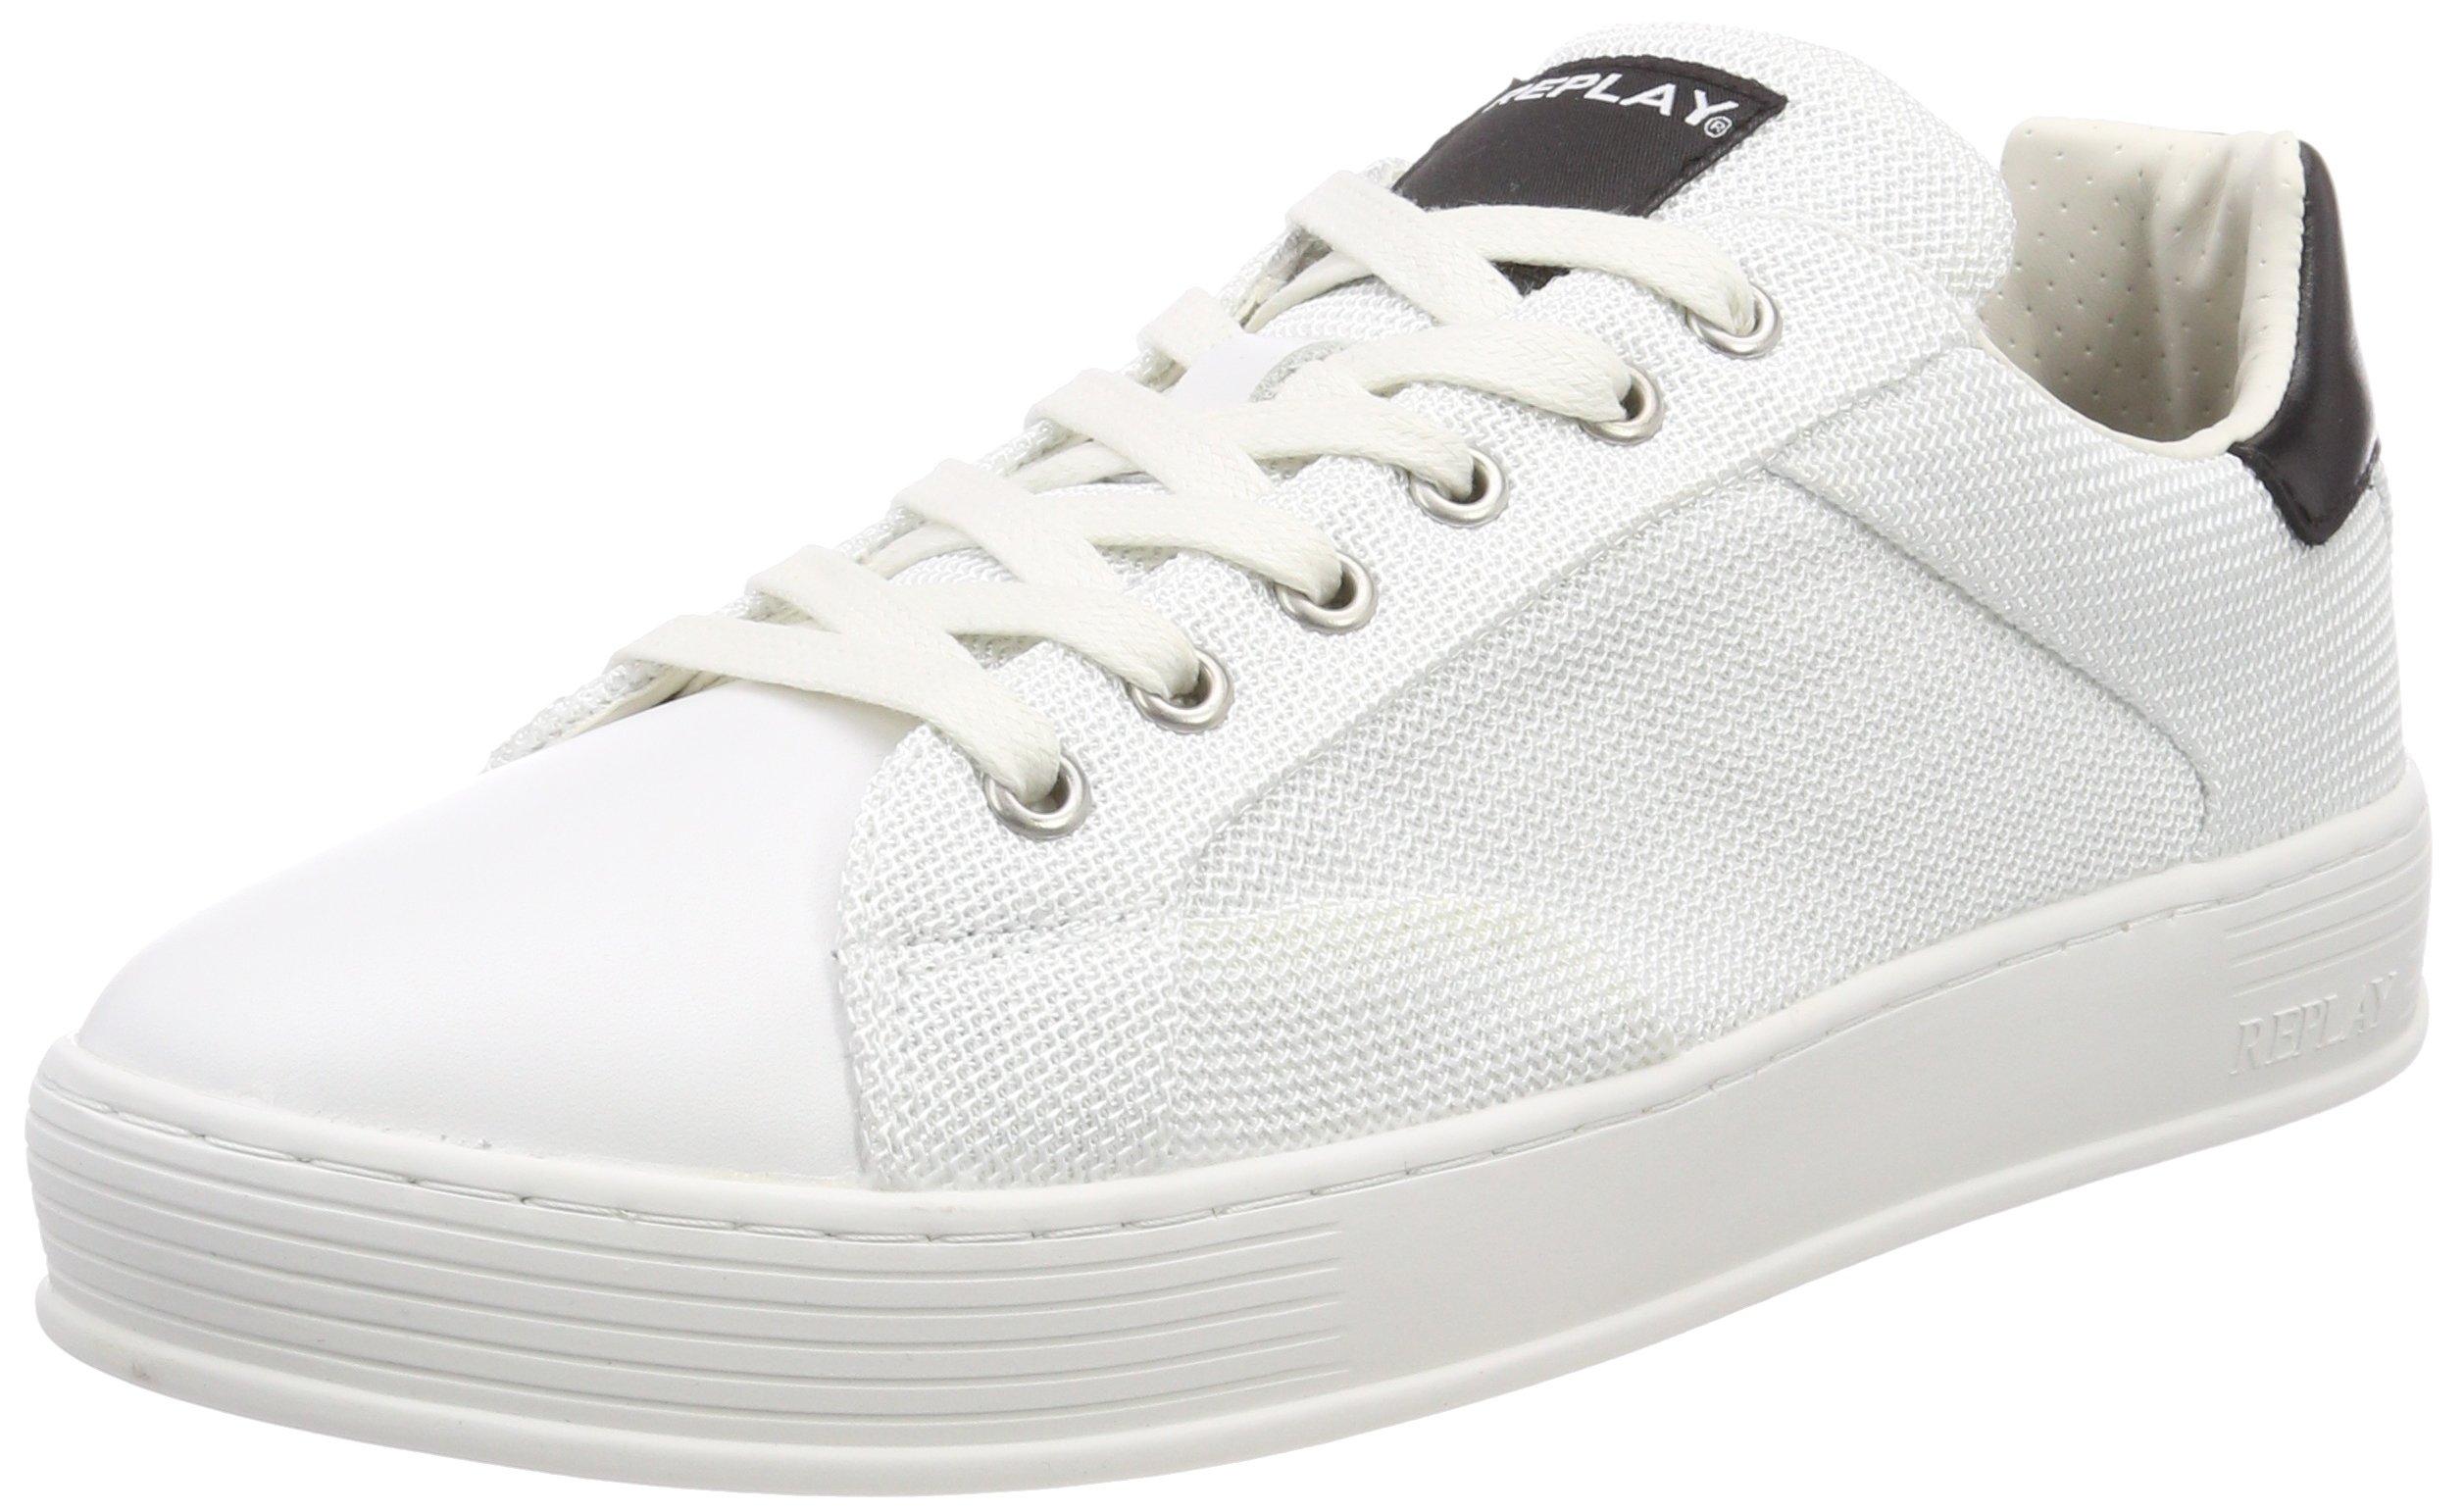 Replay Basses Eu Black43 AlvinSneakers HommeMulticolorewhite T3Jl1ucFK